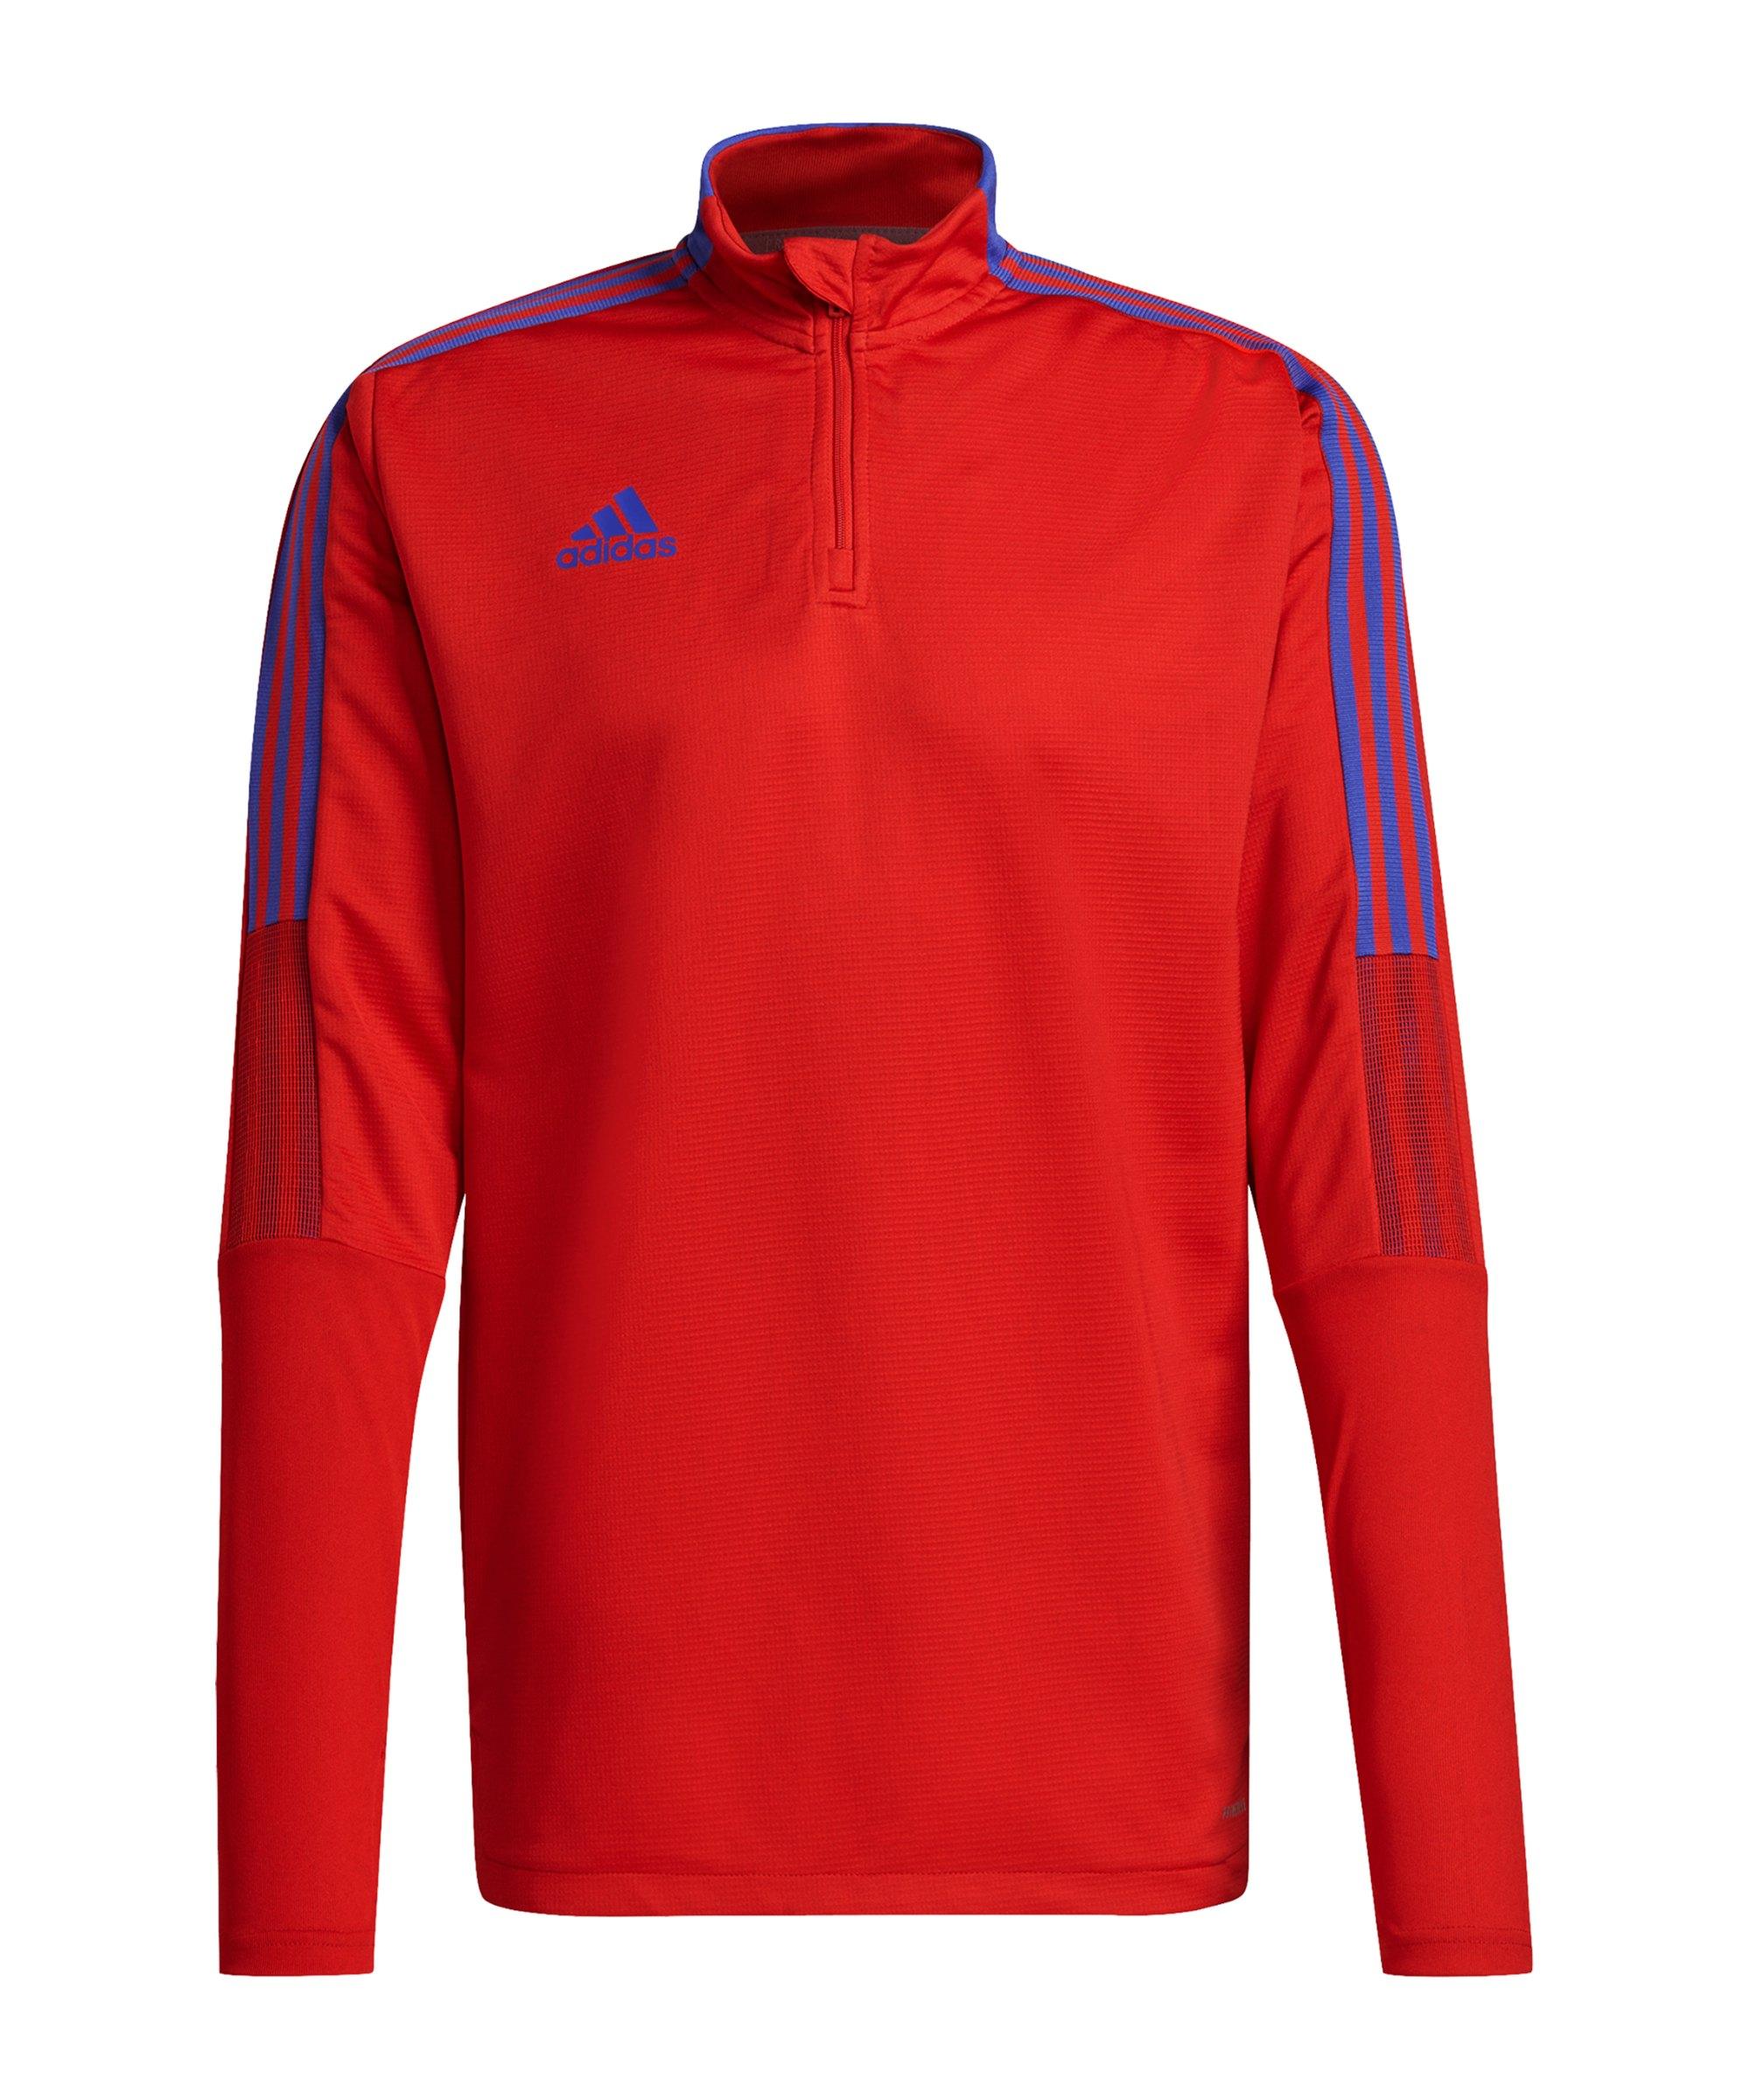 adidas Tiro Primeblue Top Training Rot Blau - rot